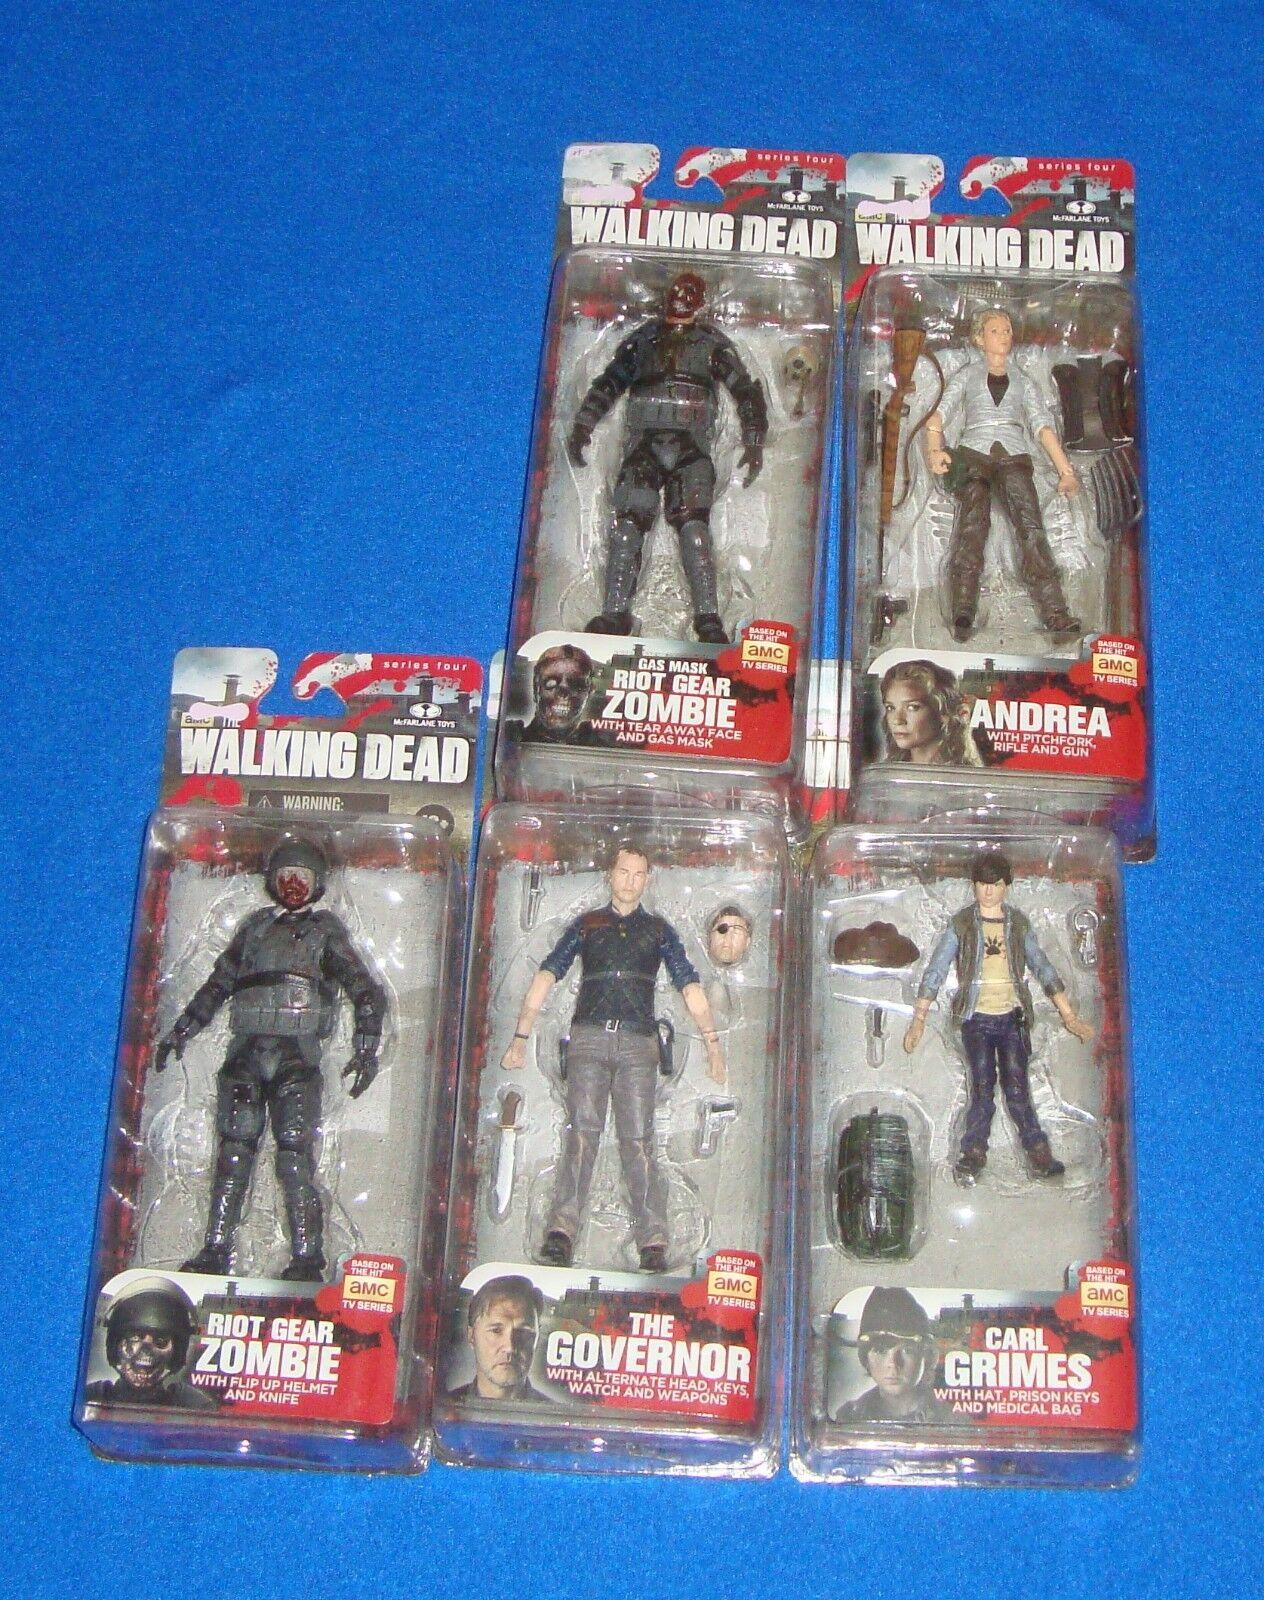 The Walking Dead Series 4 Figure Lot Lot Lot of 5 All MIB 4836a1